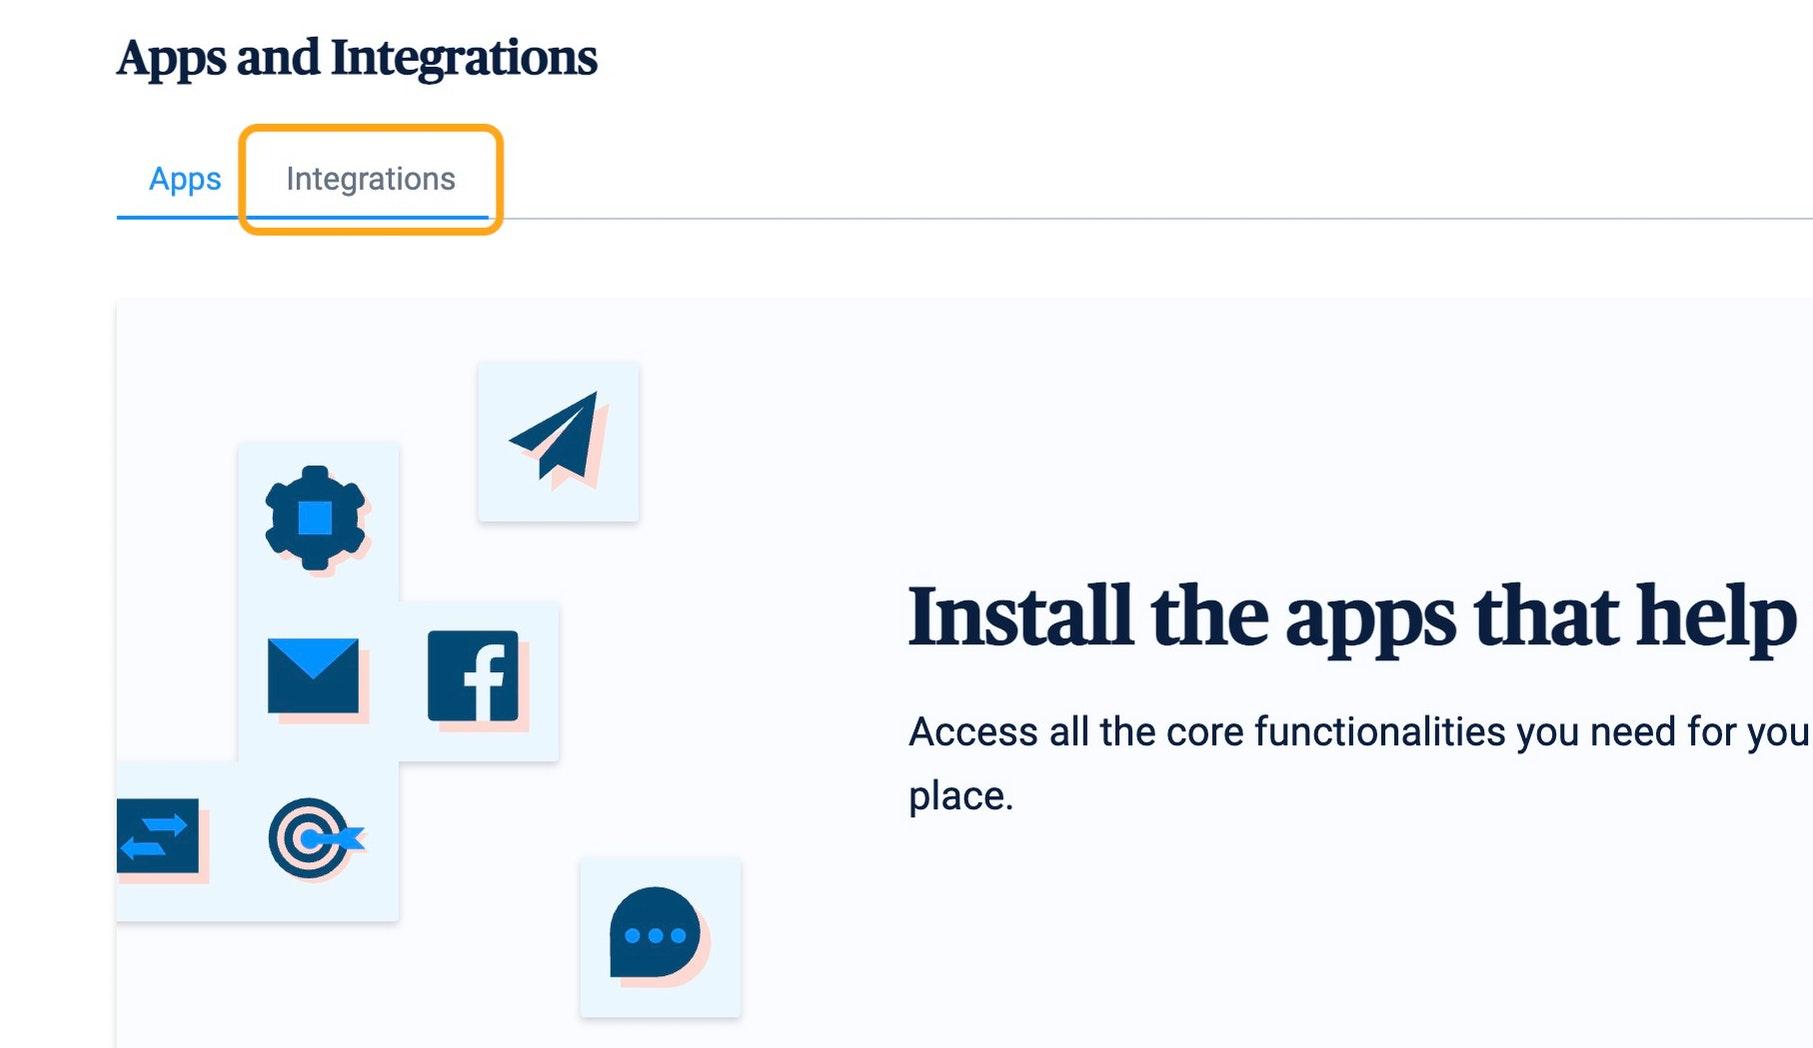 Click on Integrations